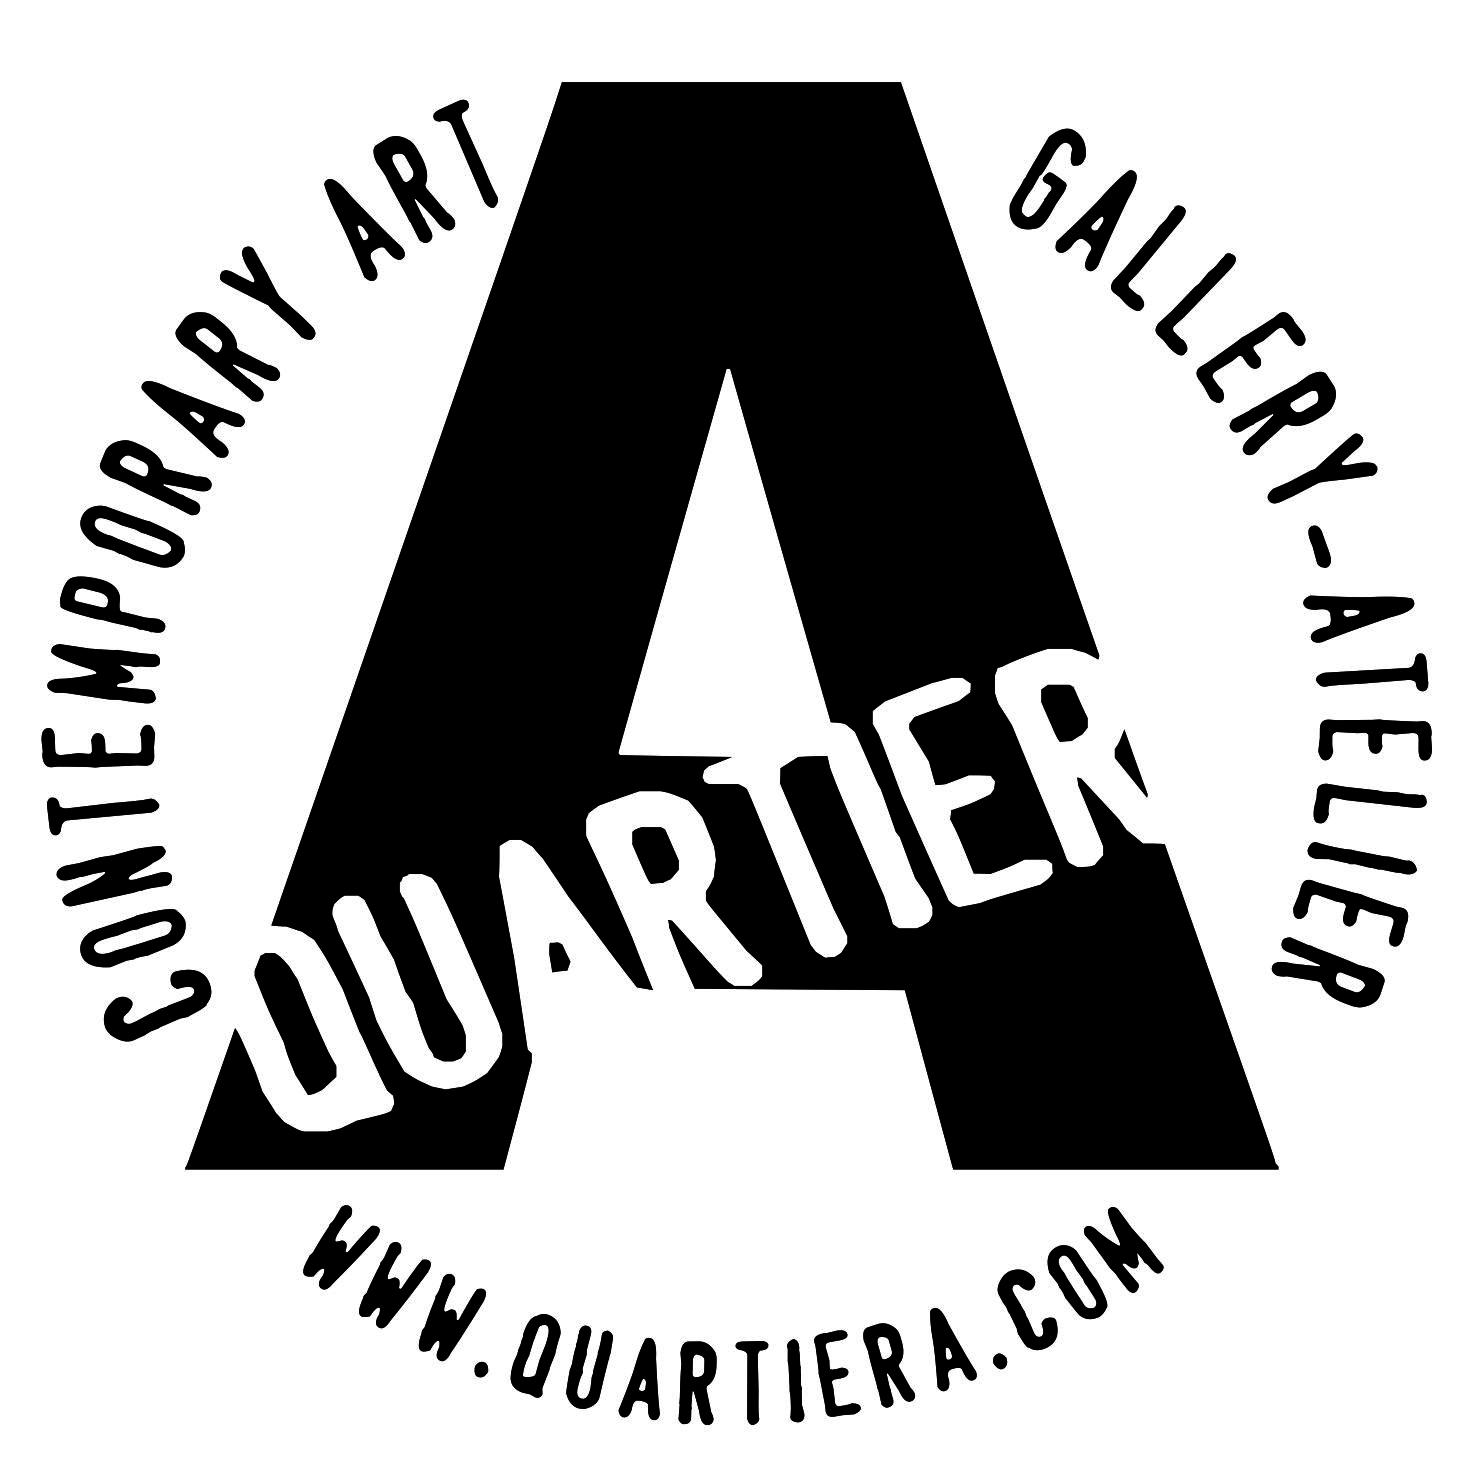 QuARTierA_circle.jpg